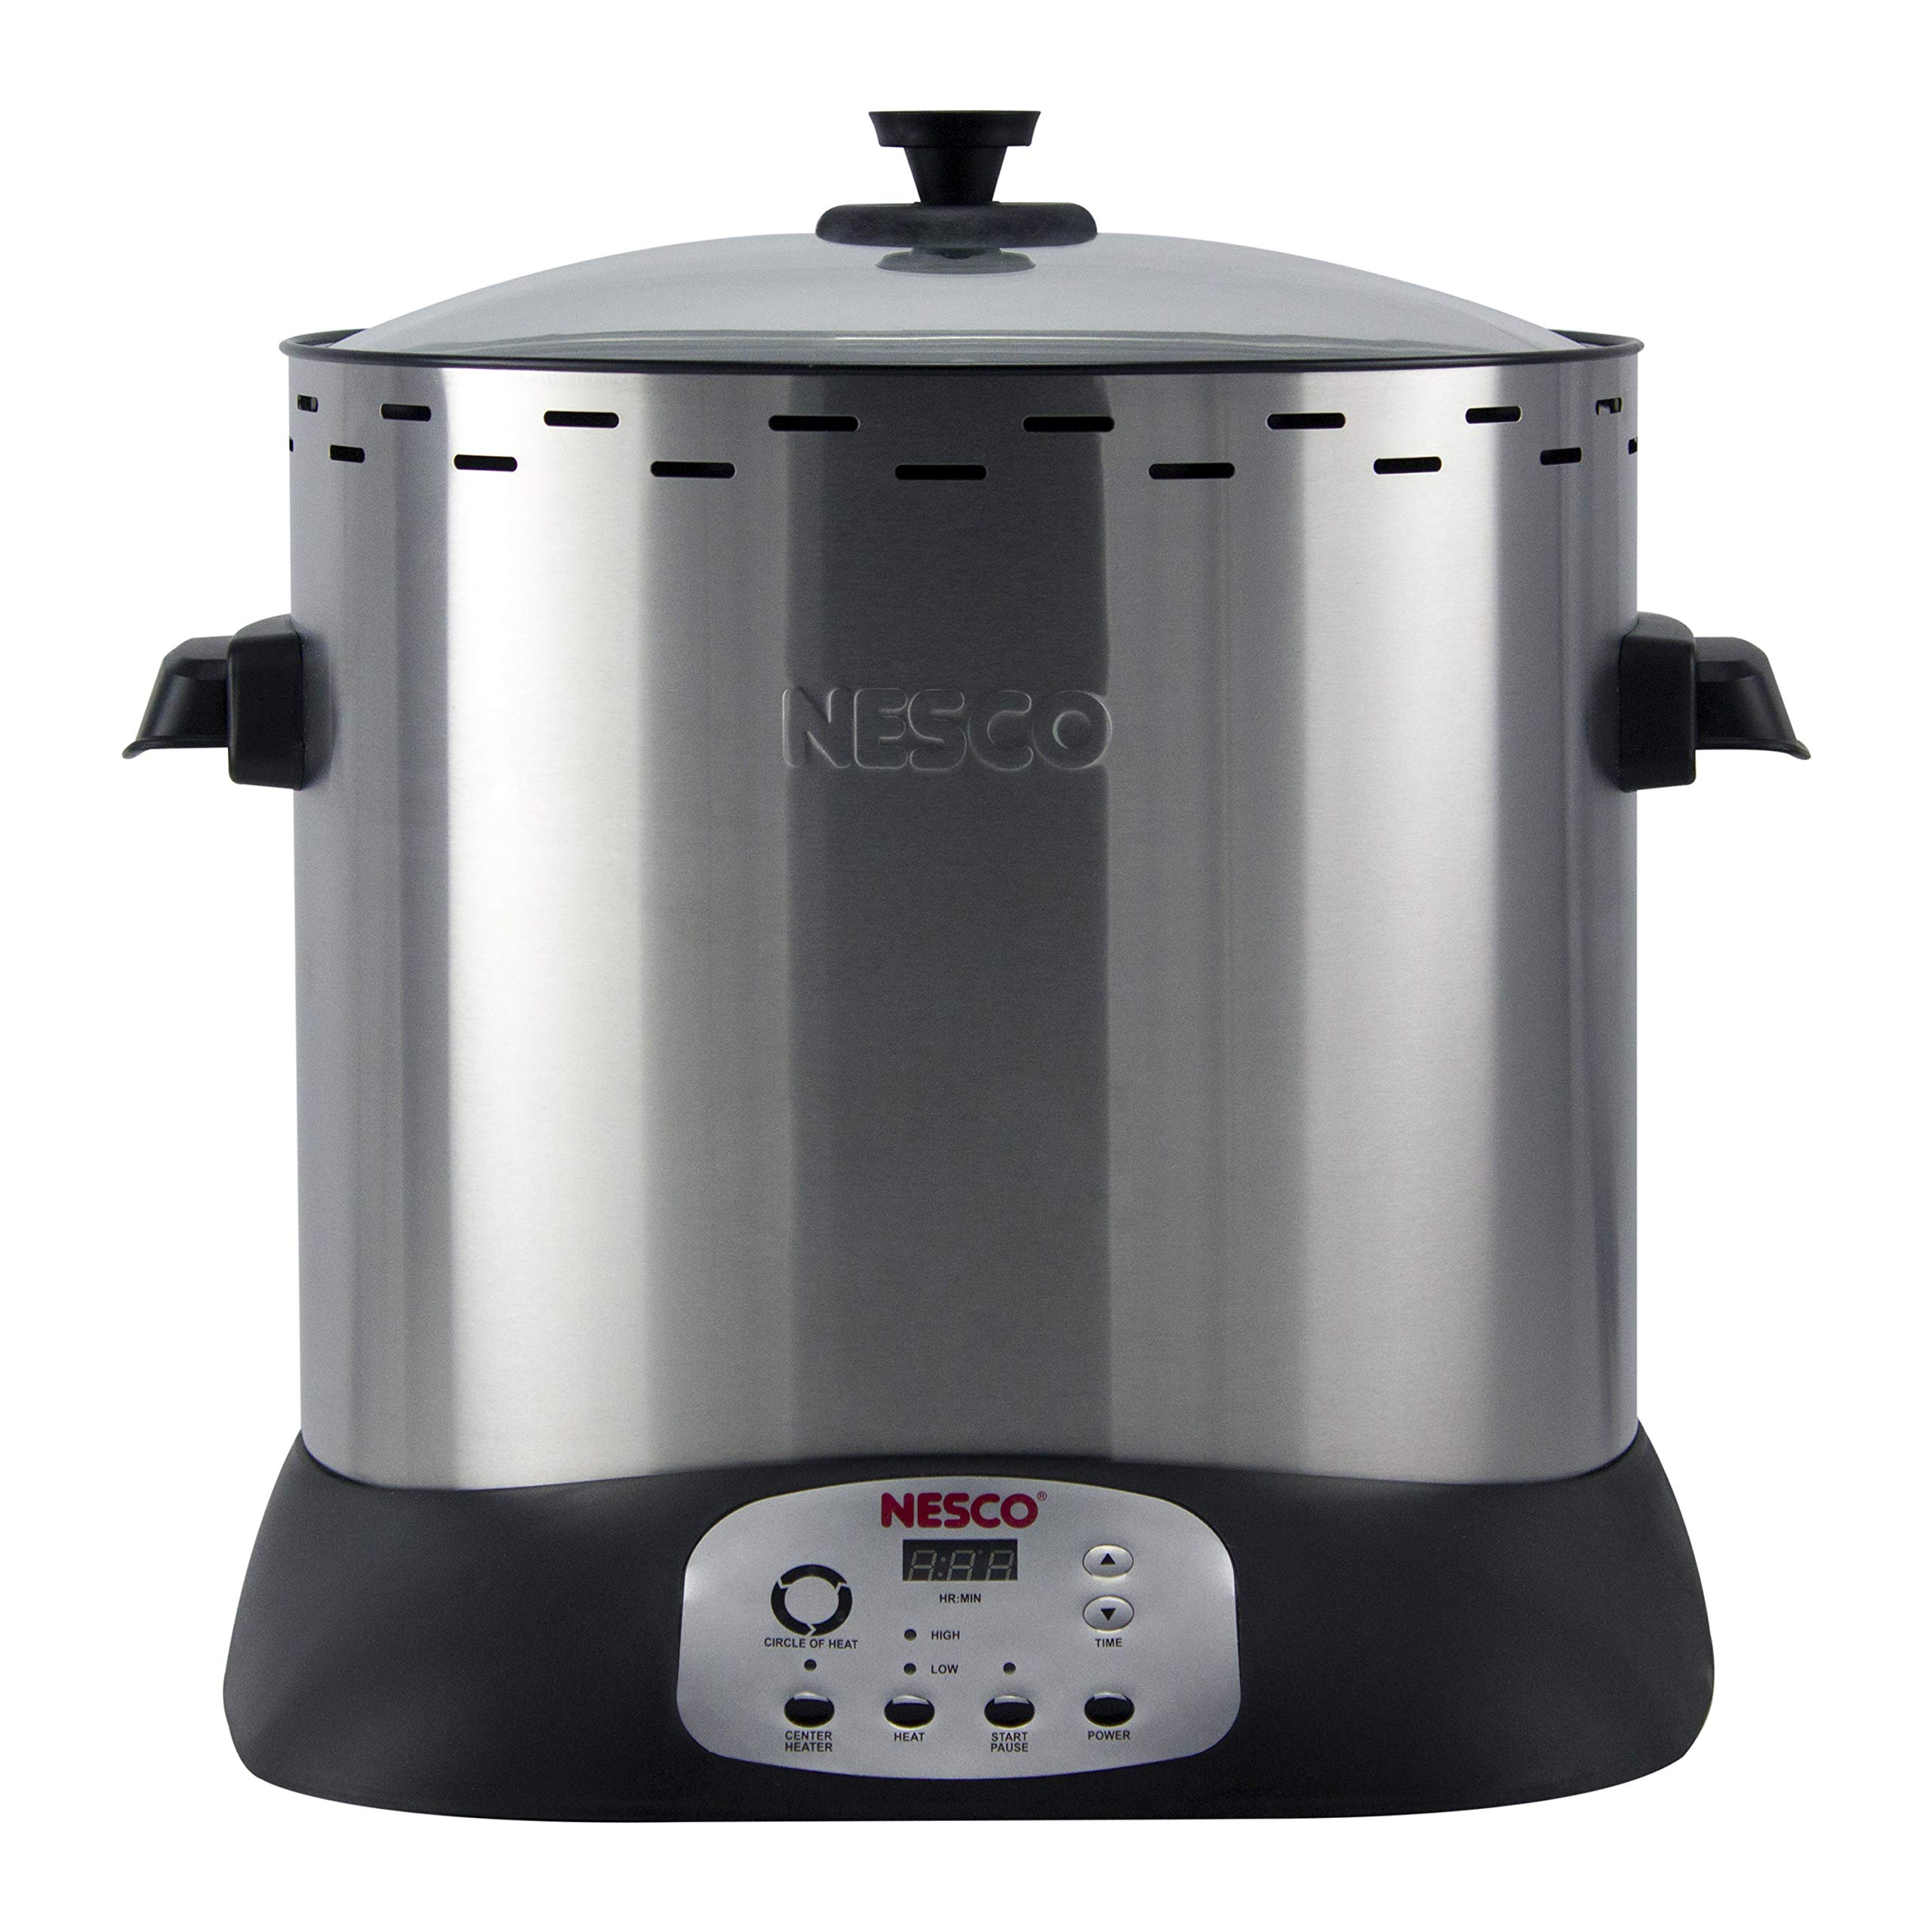 NESCO ITR-01 Digital Infrared Upright Turkey Roaster, Oil Free, 1420 Watts, Silver by NESCO